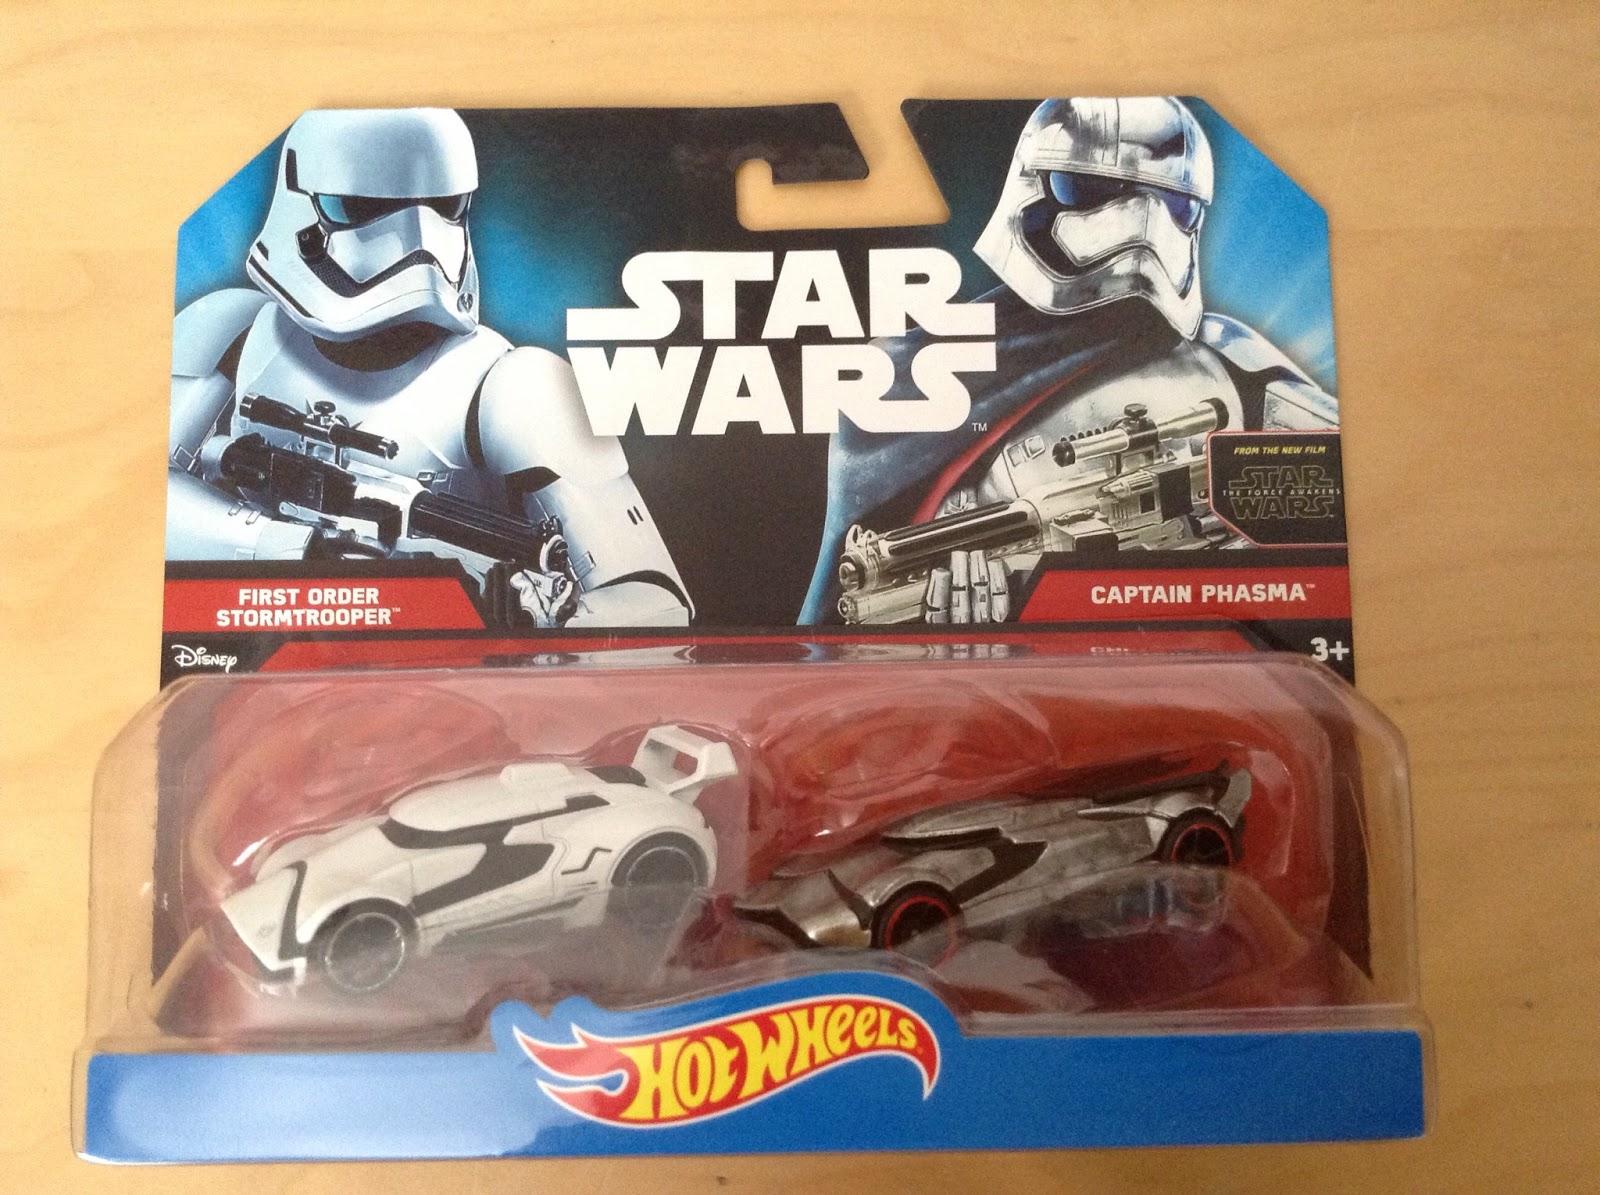 Car Wars: Julian's Hot Wheels Blog: Star Wars Character Cars 2-Pack